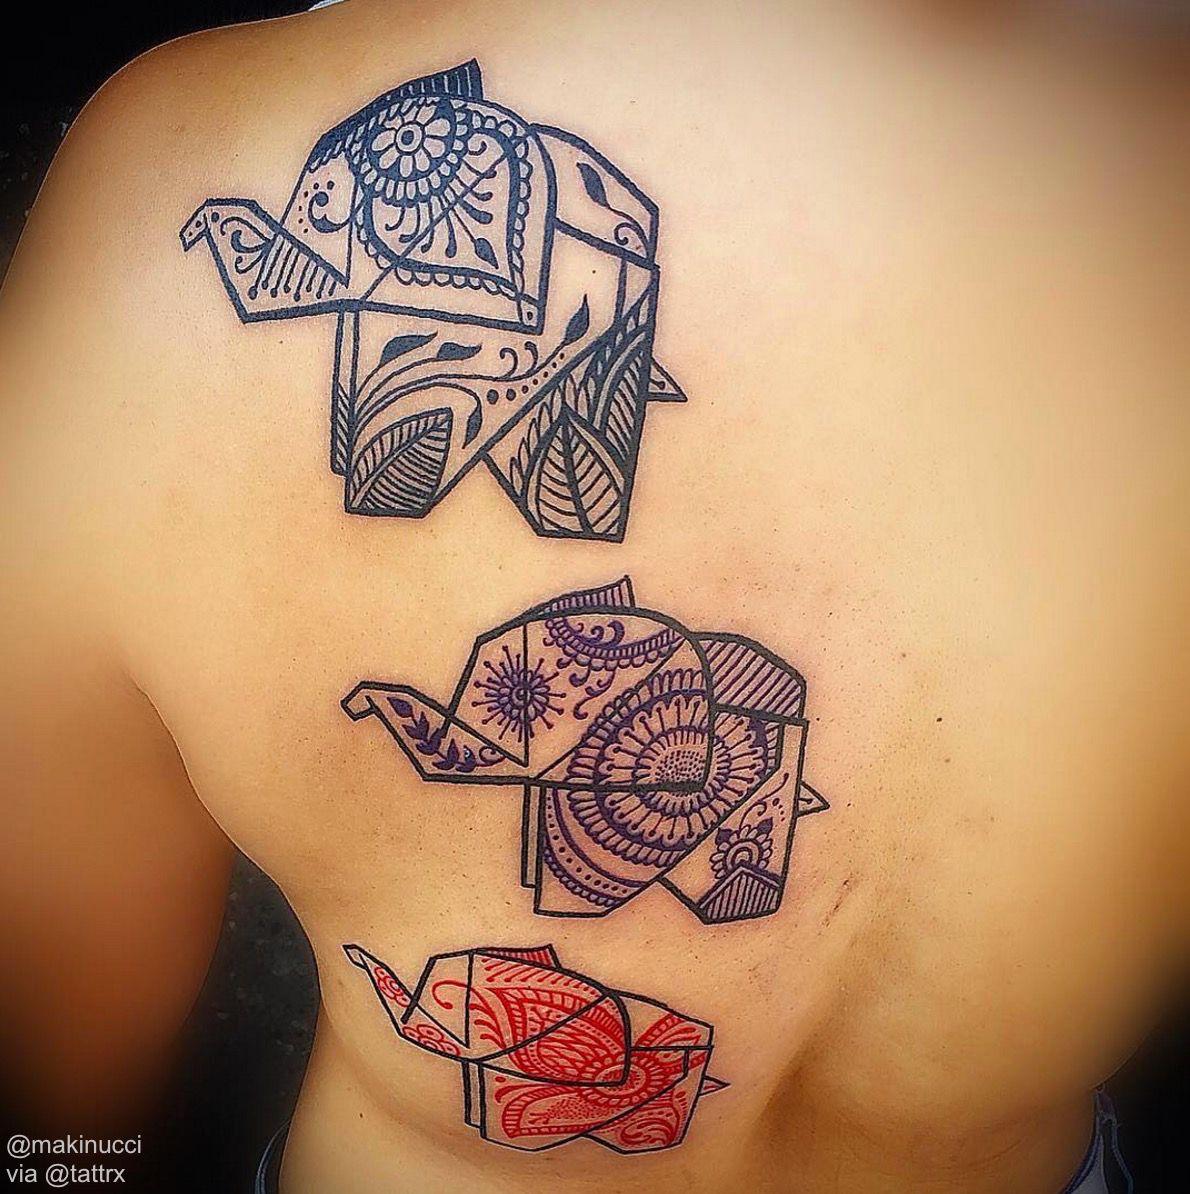 Origami Styled Elephants With Mandala Patters Tattoo Inspiration